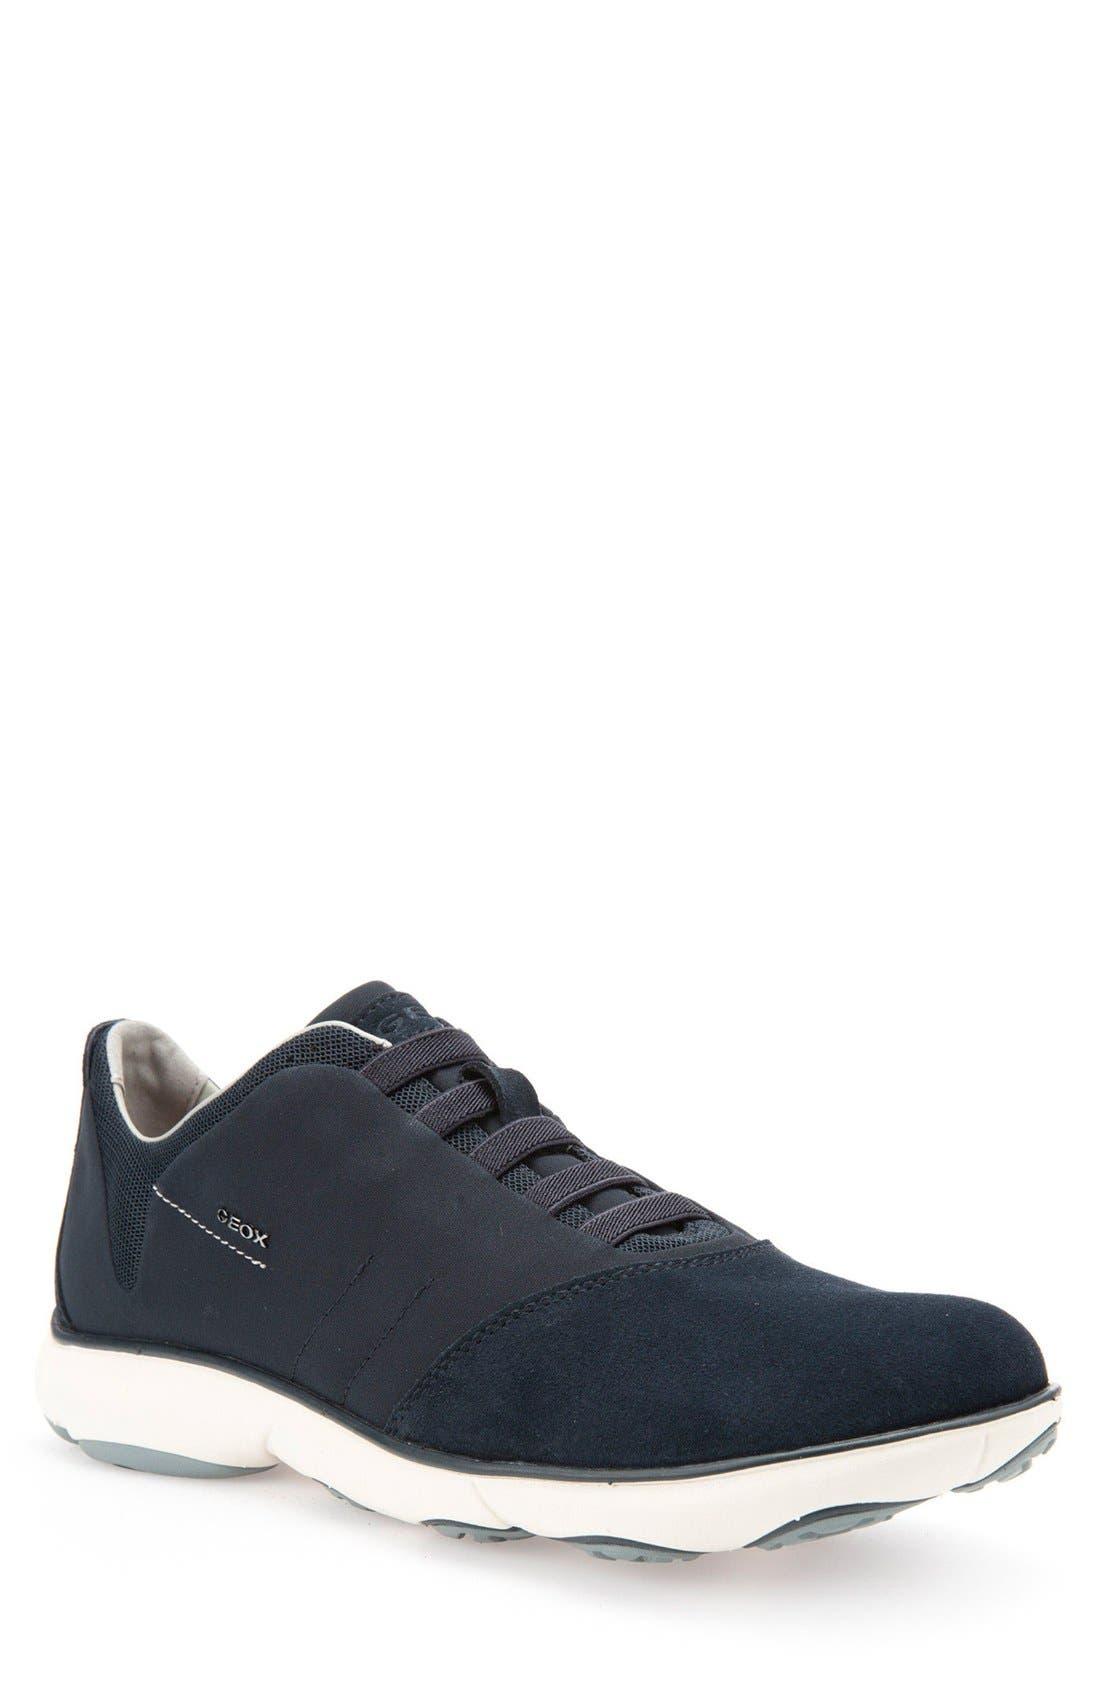 Nebula10 Slip-On Sneaker,                         Main,                         color, NAVY SUEDE